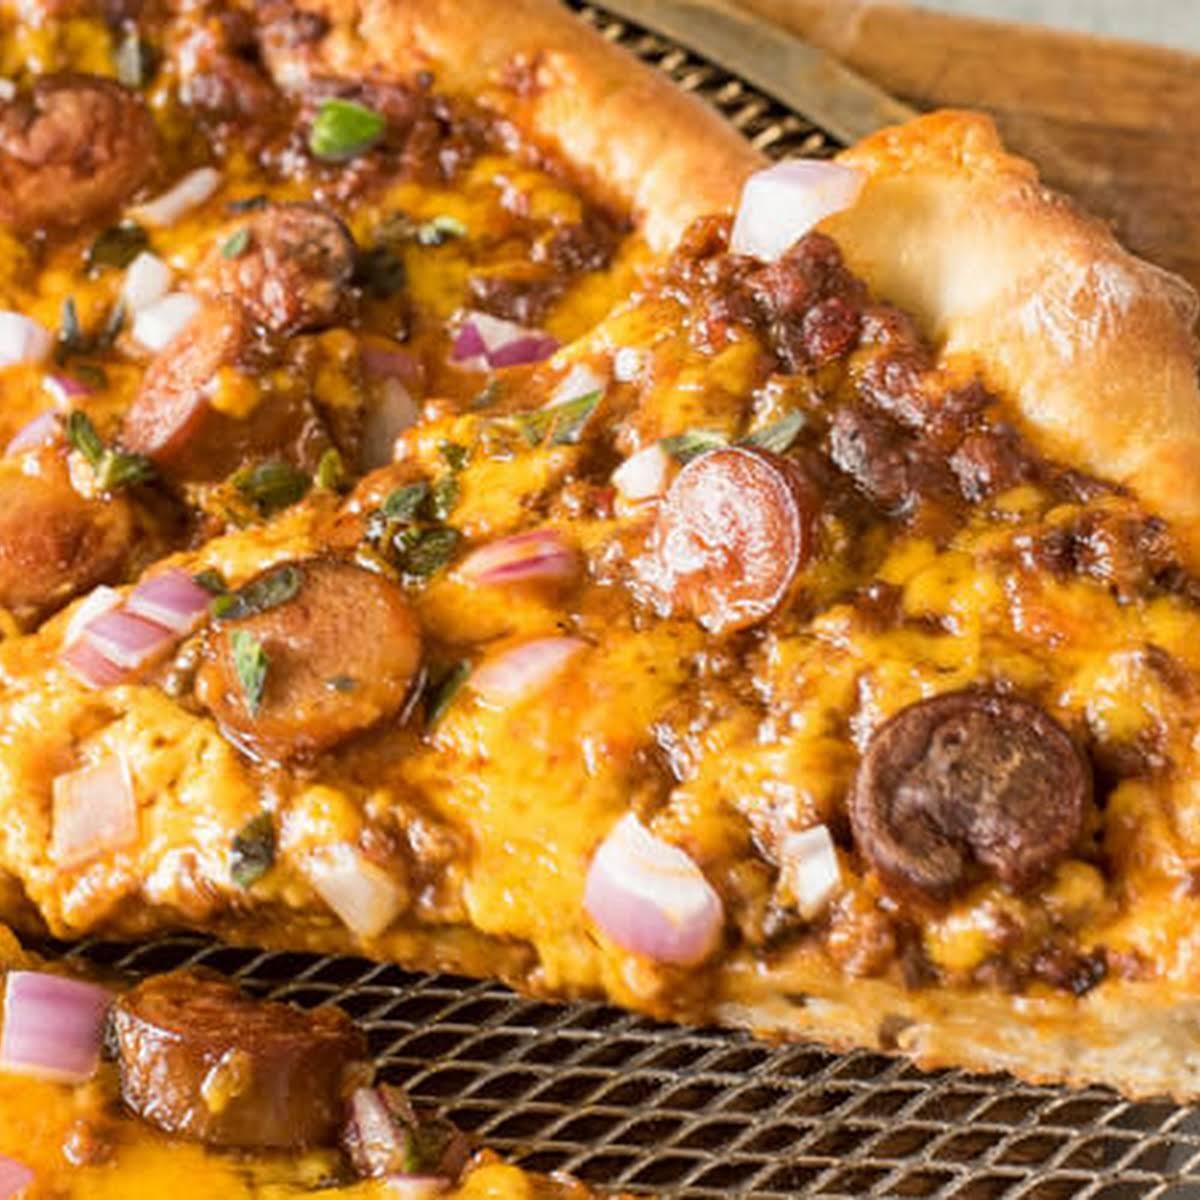 Chili Cheese Pizza